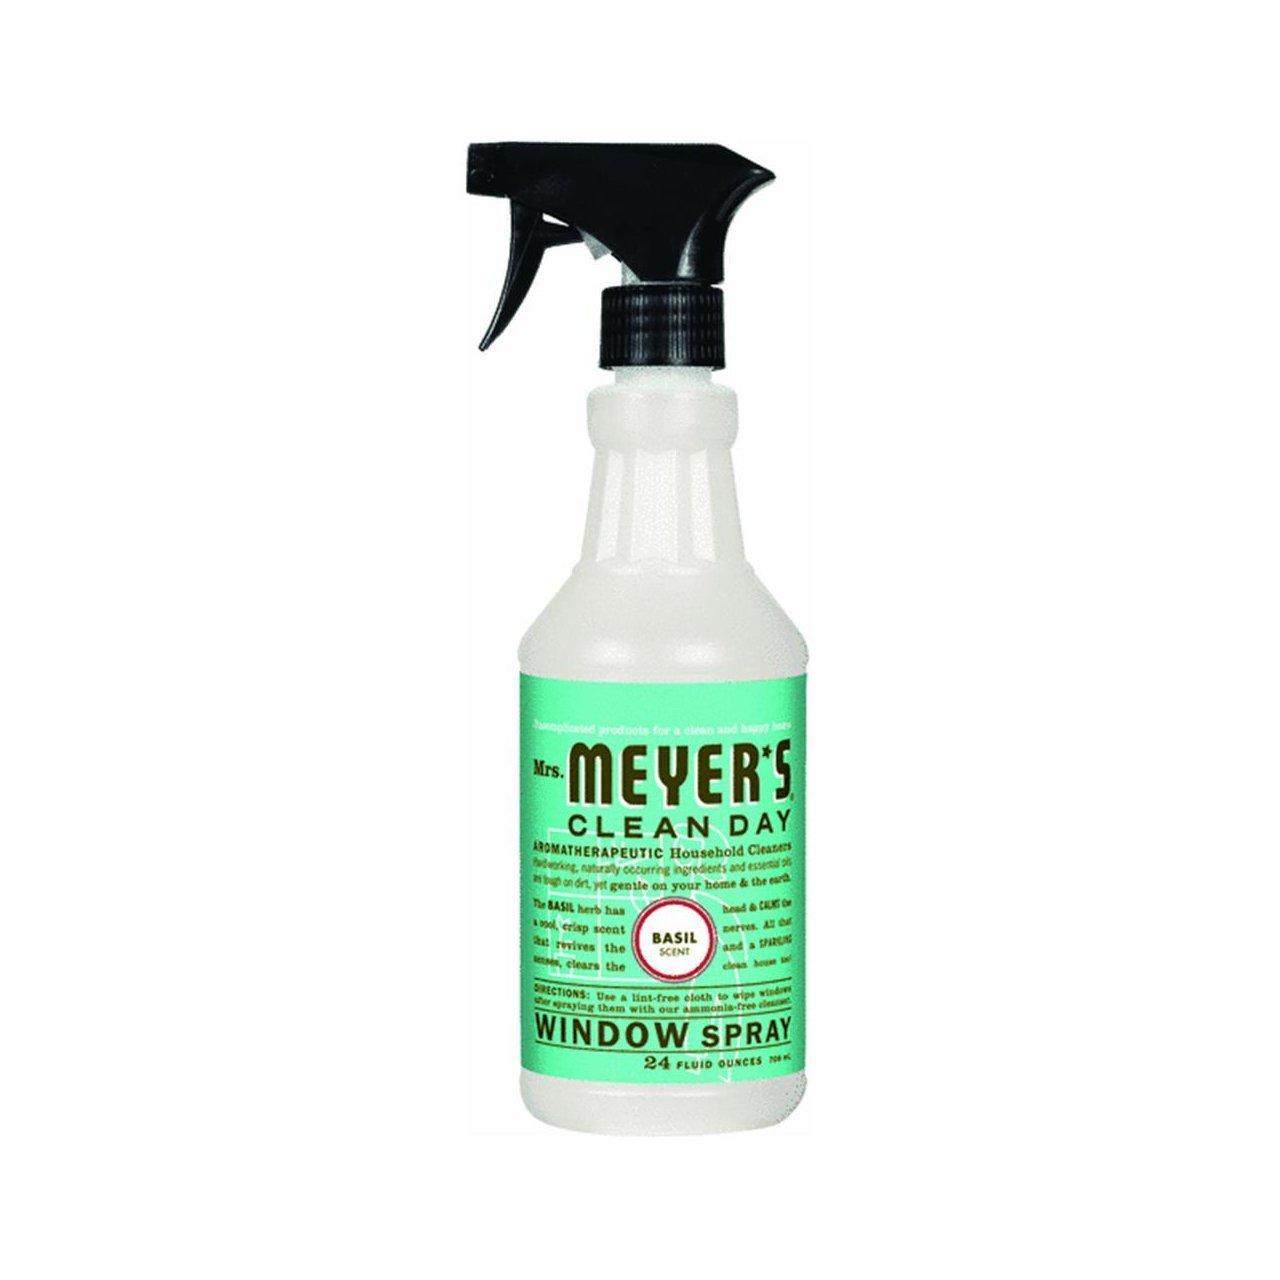 Mrs. Meyer's Clean Day Basil Window Spray